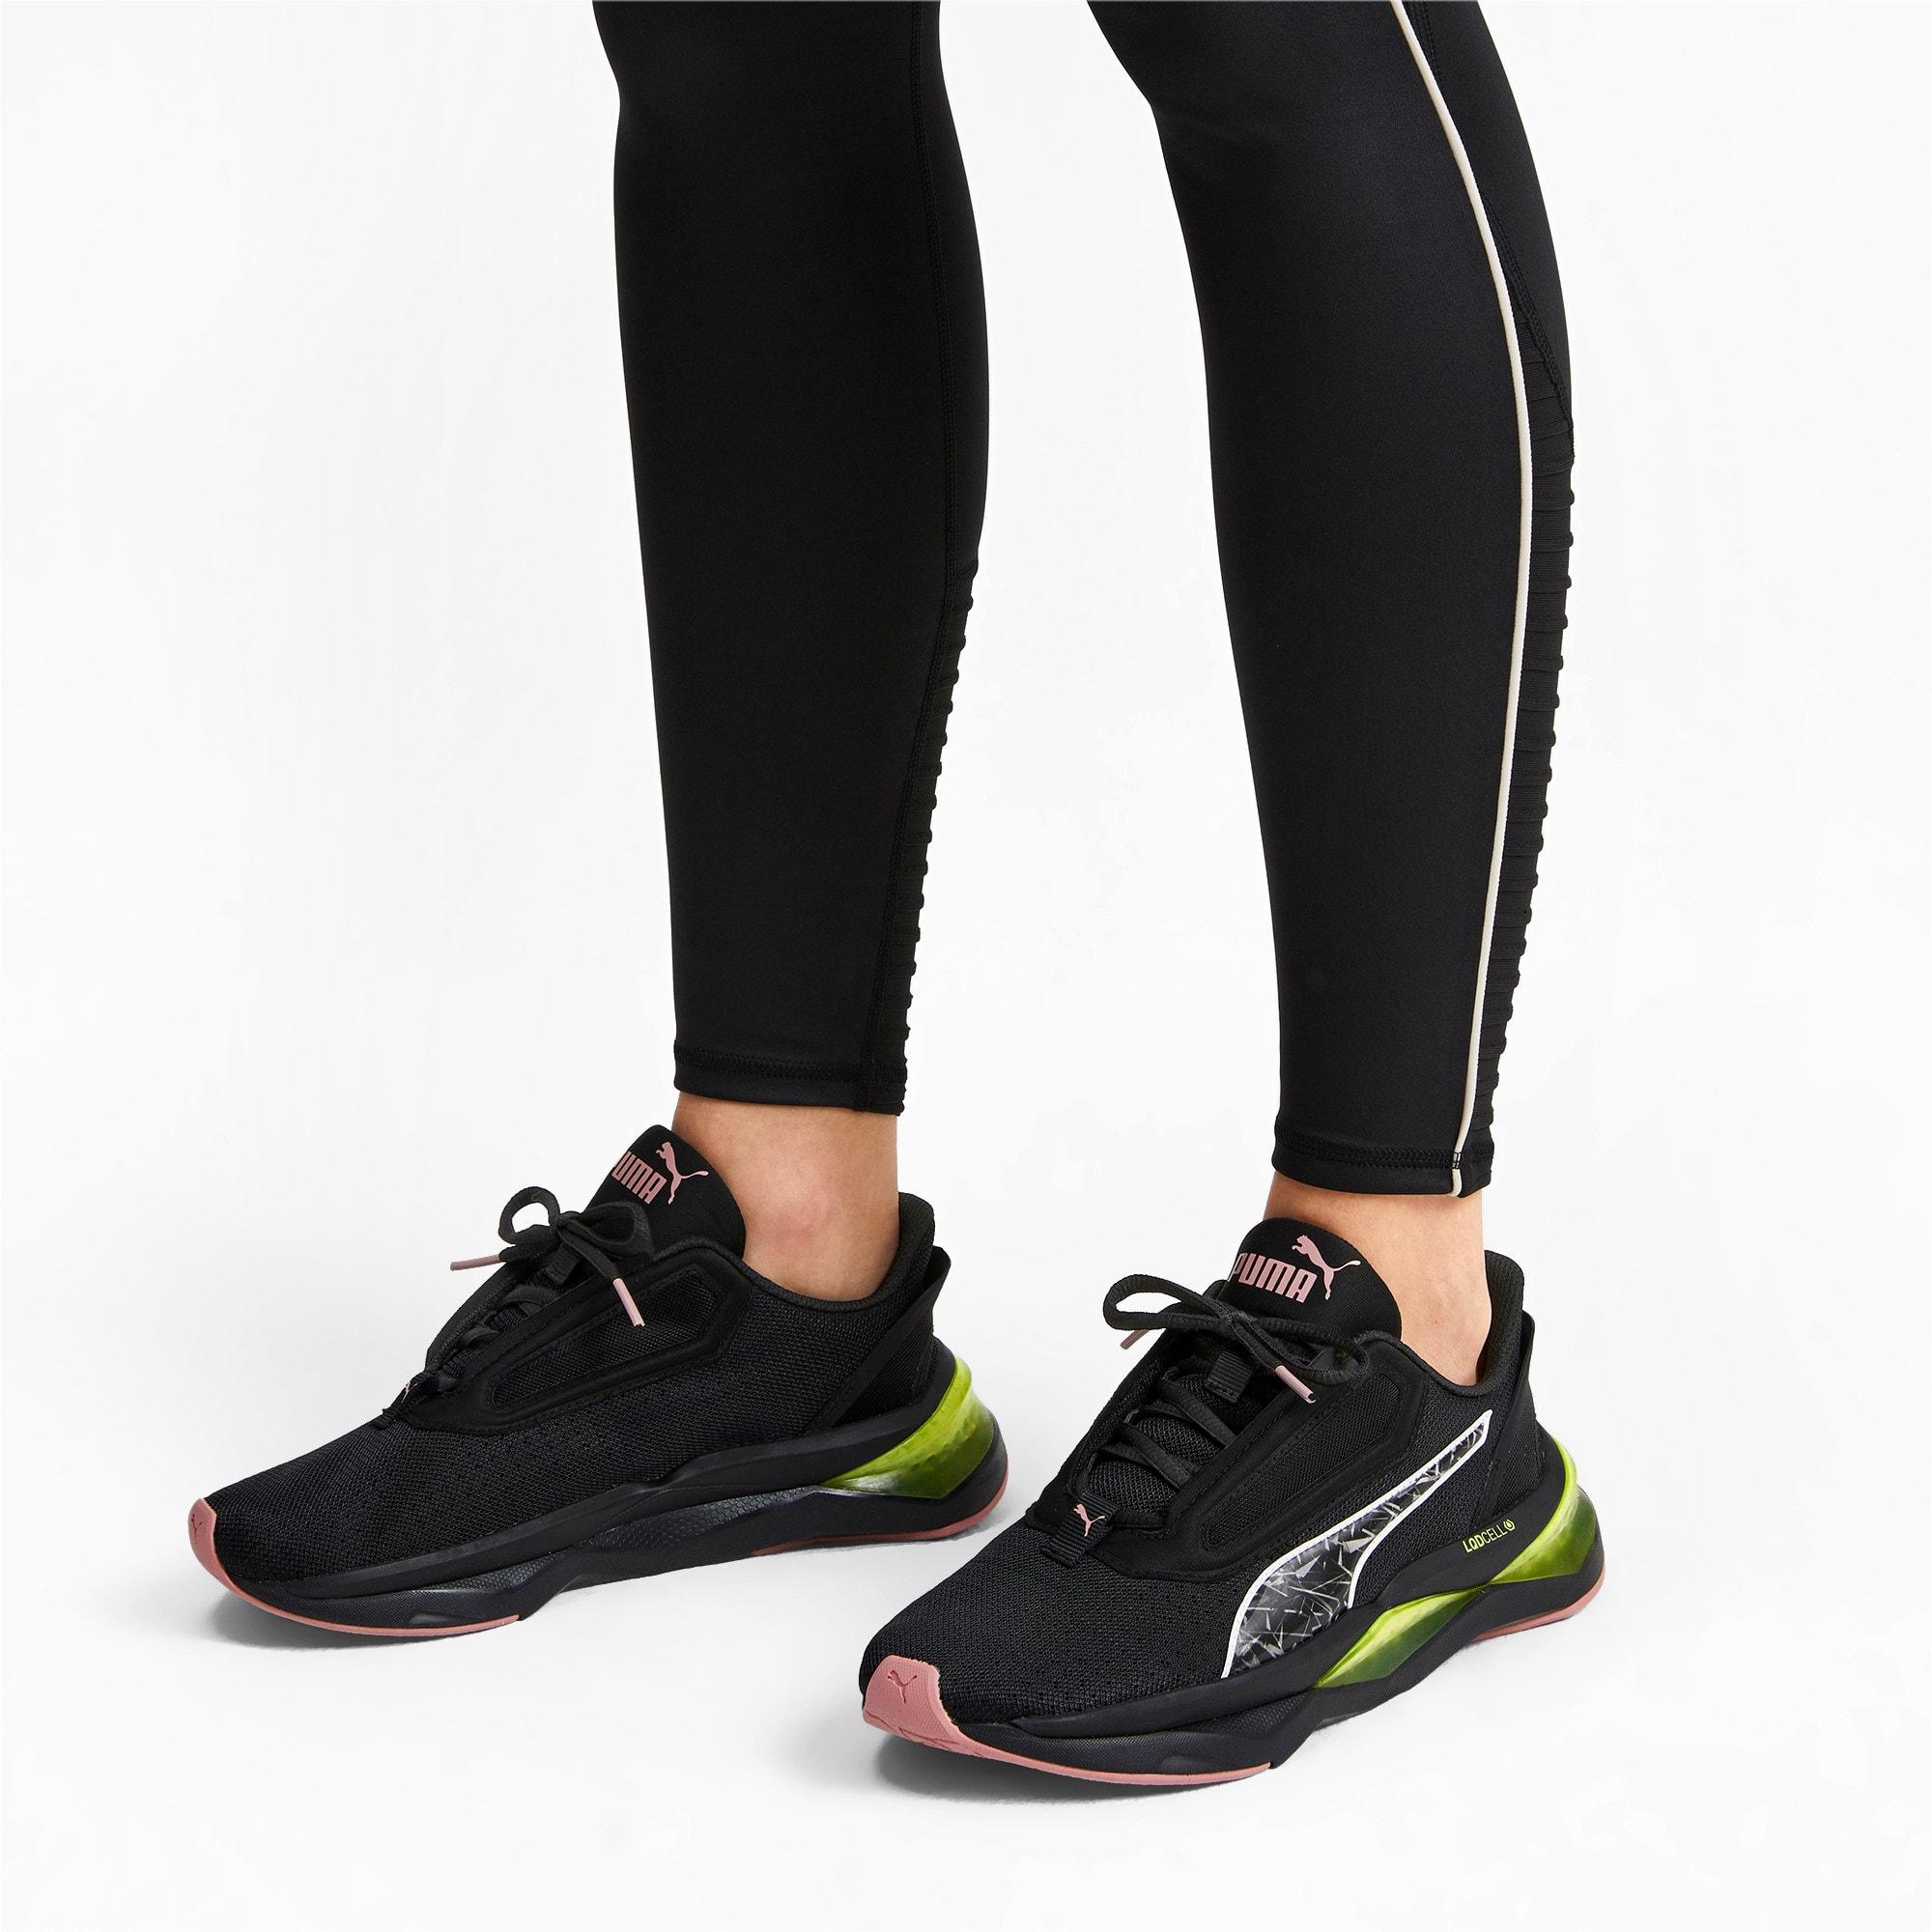 Thumbnail 2 of LQDCELL Shatter XT Women's Training Shoes, Puma Black-Yellow Alert, medium-IND